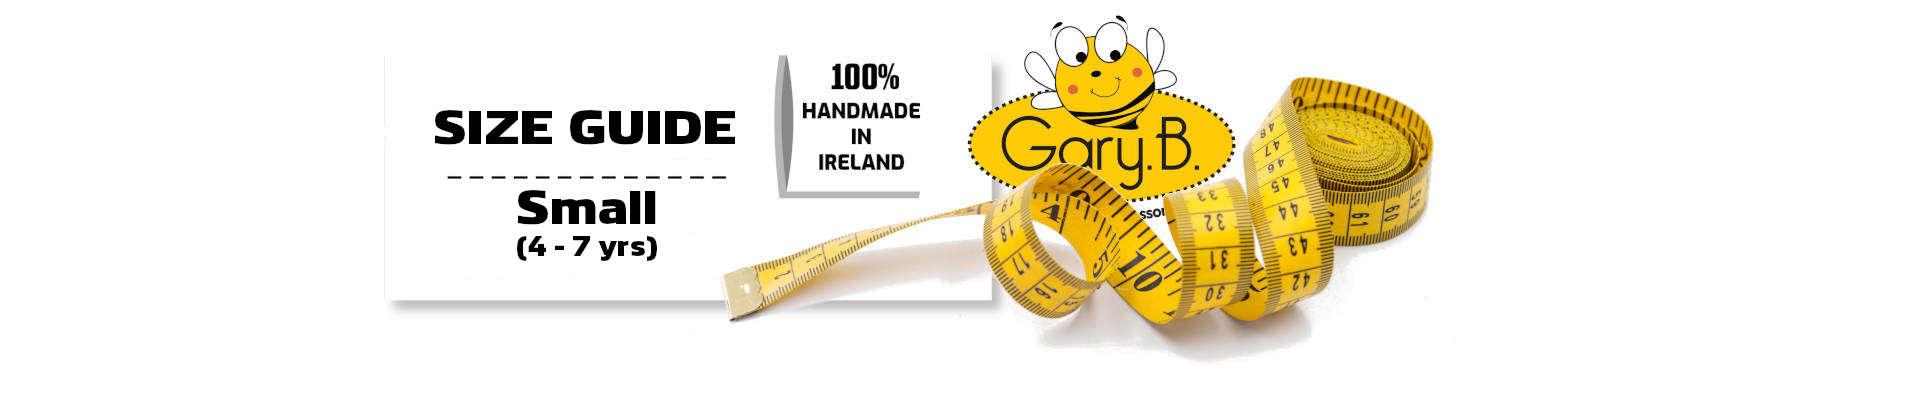 Size Guide banner GaryB